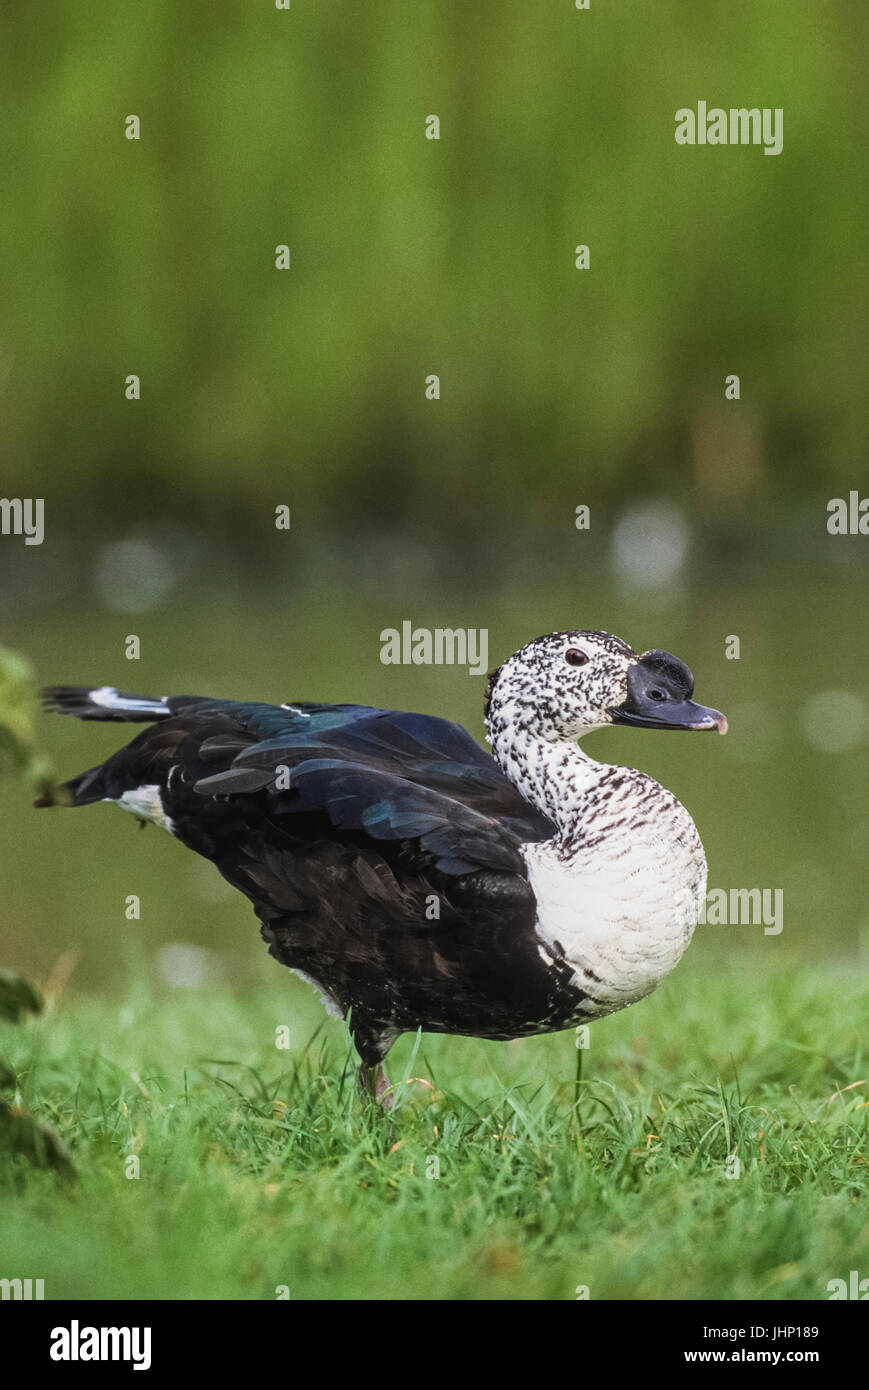 Knob-billed Duck, (Sarkidiornis melanotos), Keoladeo Ghana National Park, Bharatpur, Rajasthan, India - Stock Image